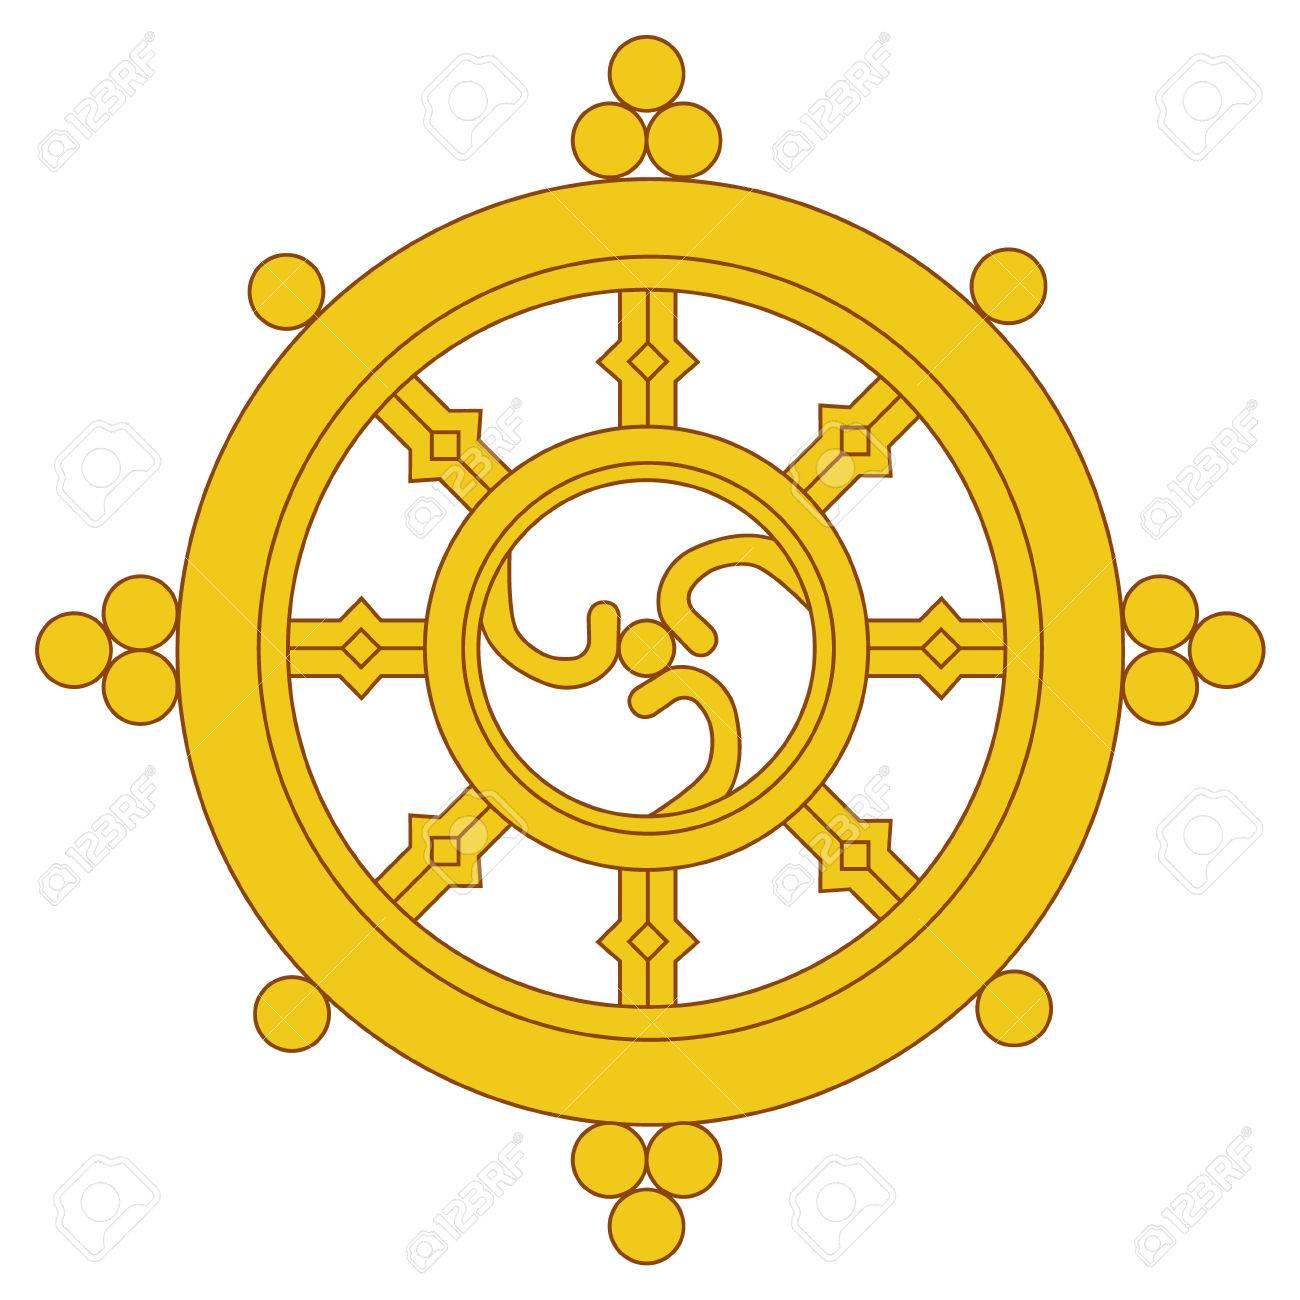 Raster illustration golden dharma wheel buddhism raster symbol raster illustration golden dharma wheel buddhism raster symbol dharmachakra stock illustration 82835930 buycottarizona Image collections